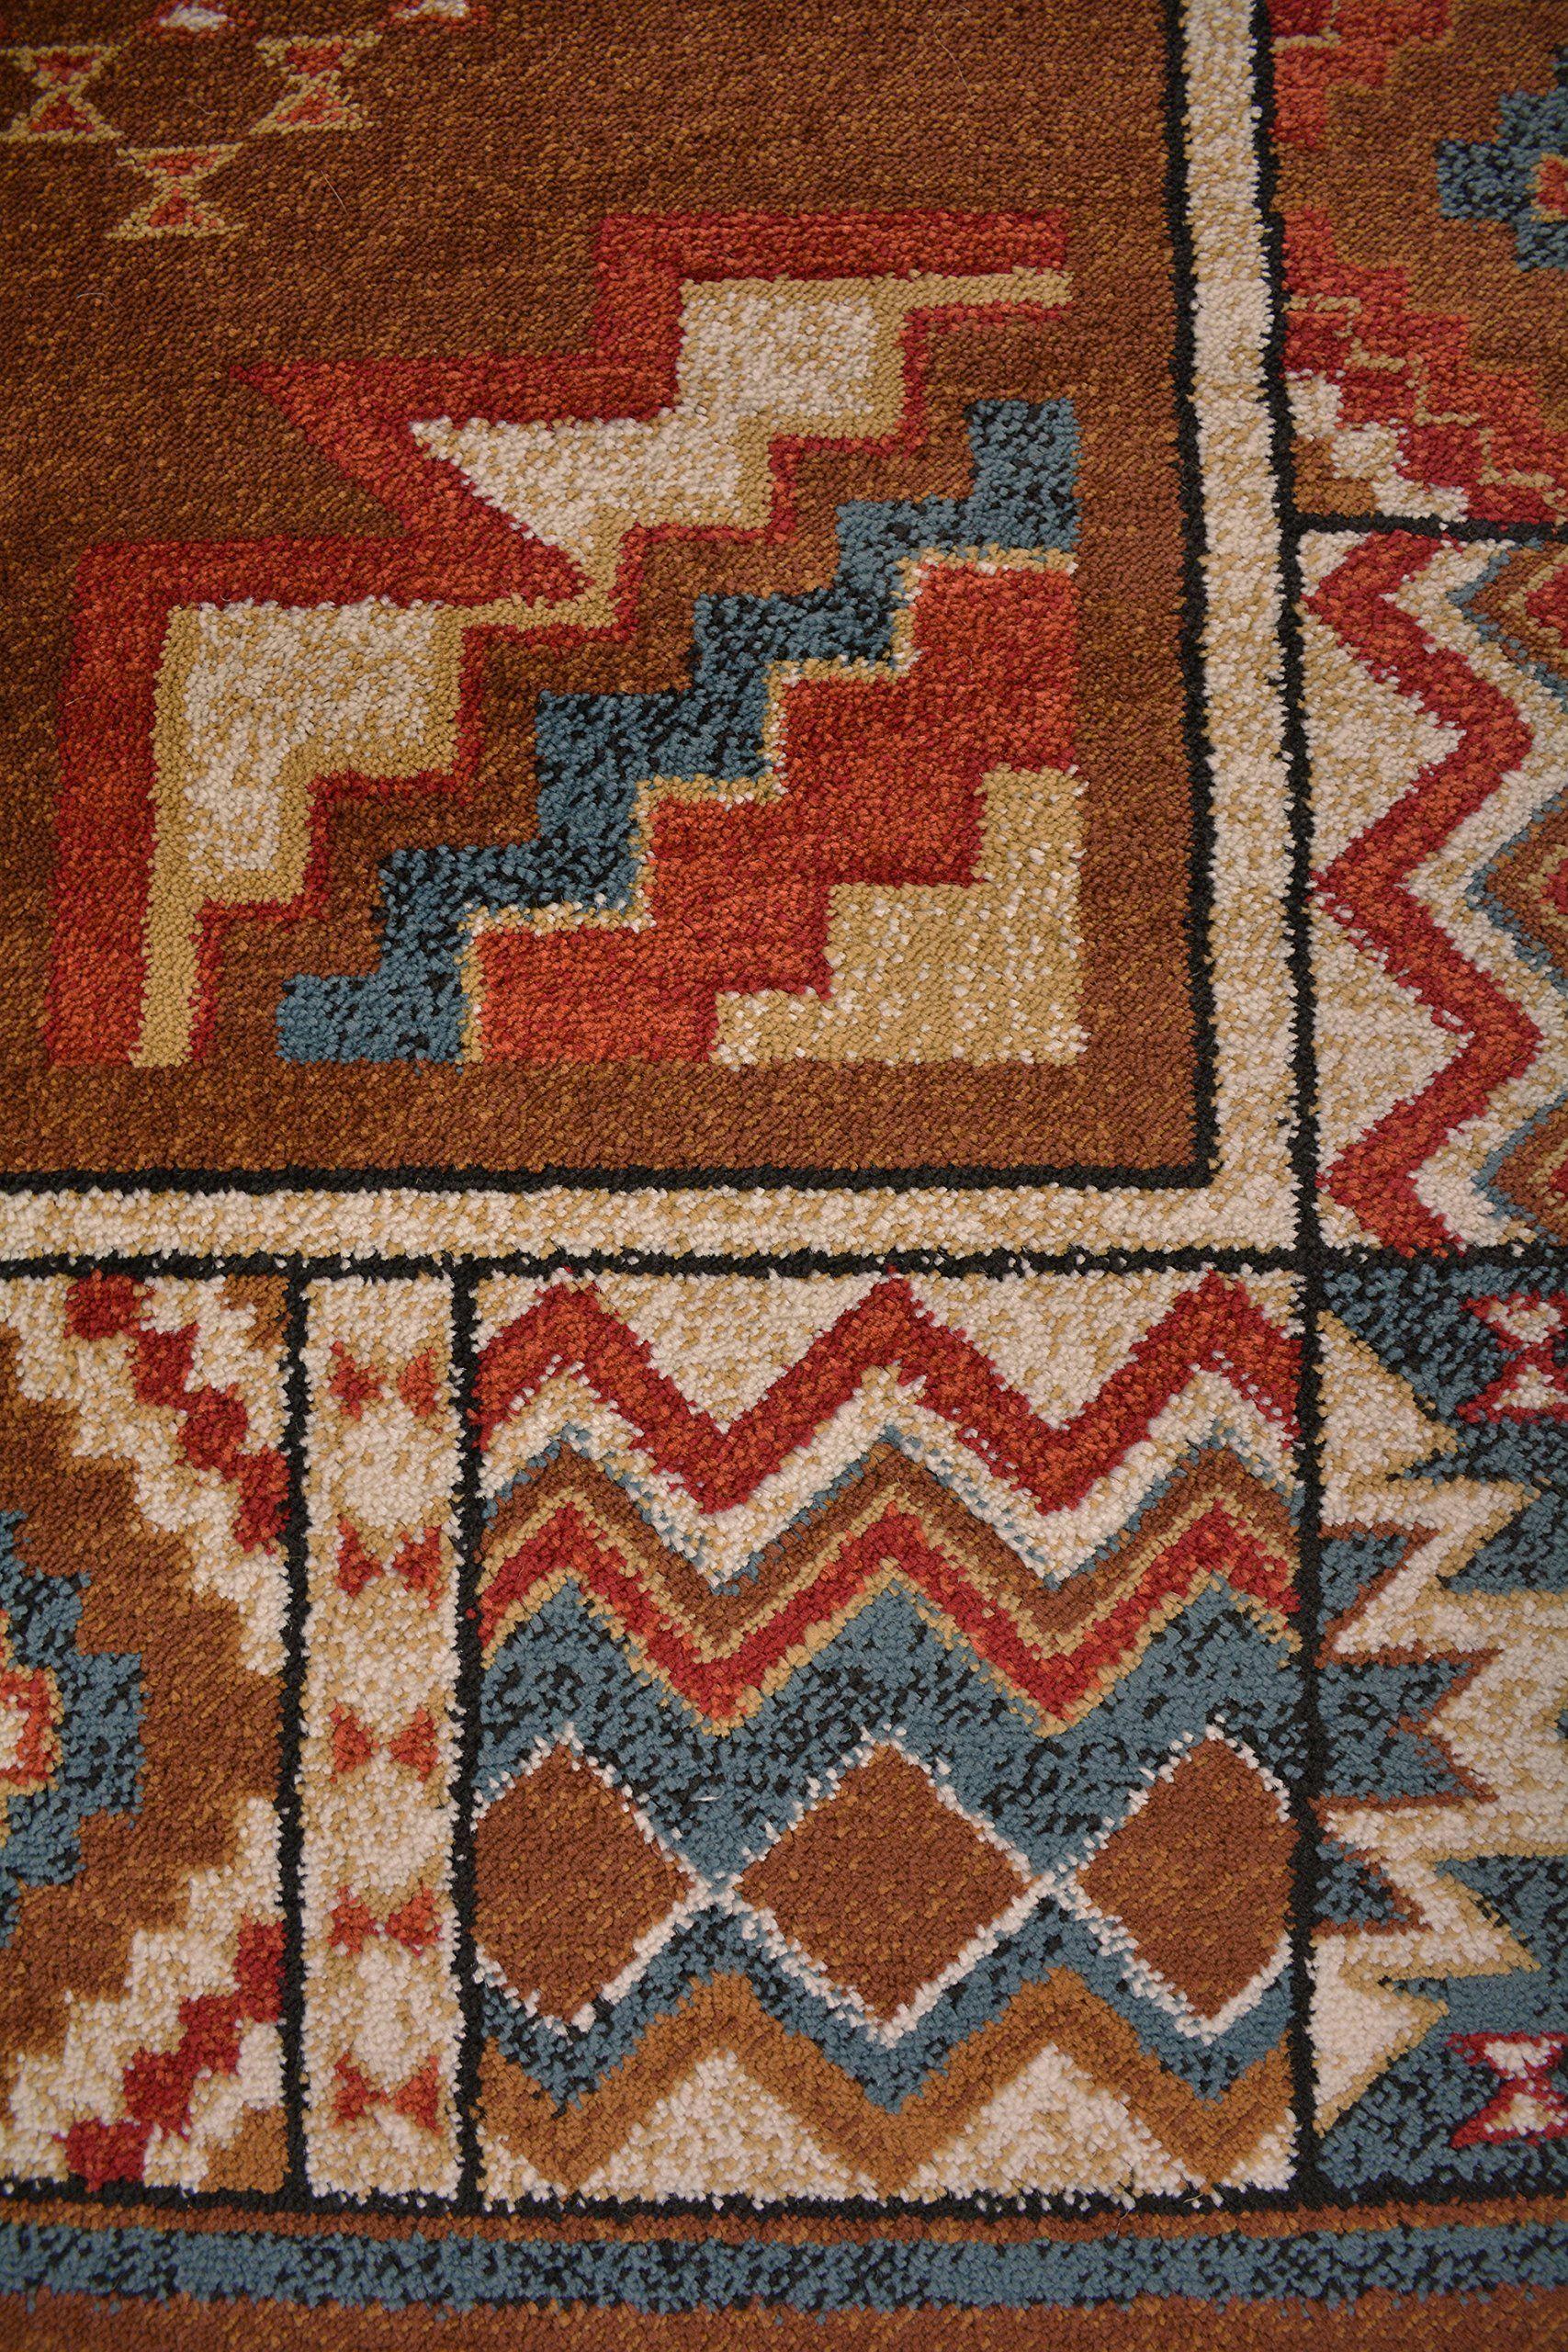 Nevita Collection Southwestern Native American Design Area Rug Rugs